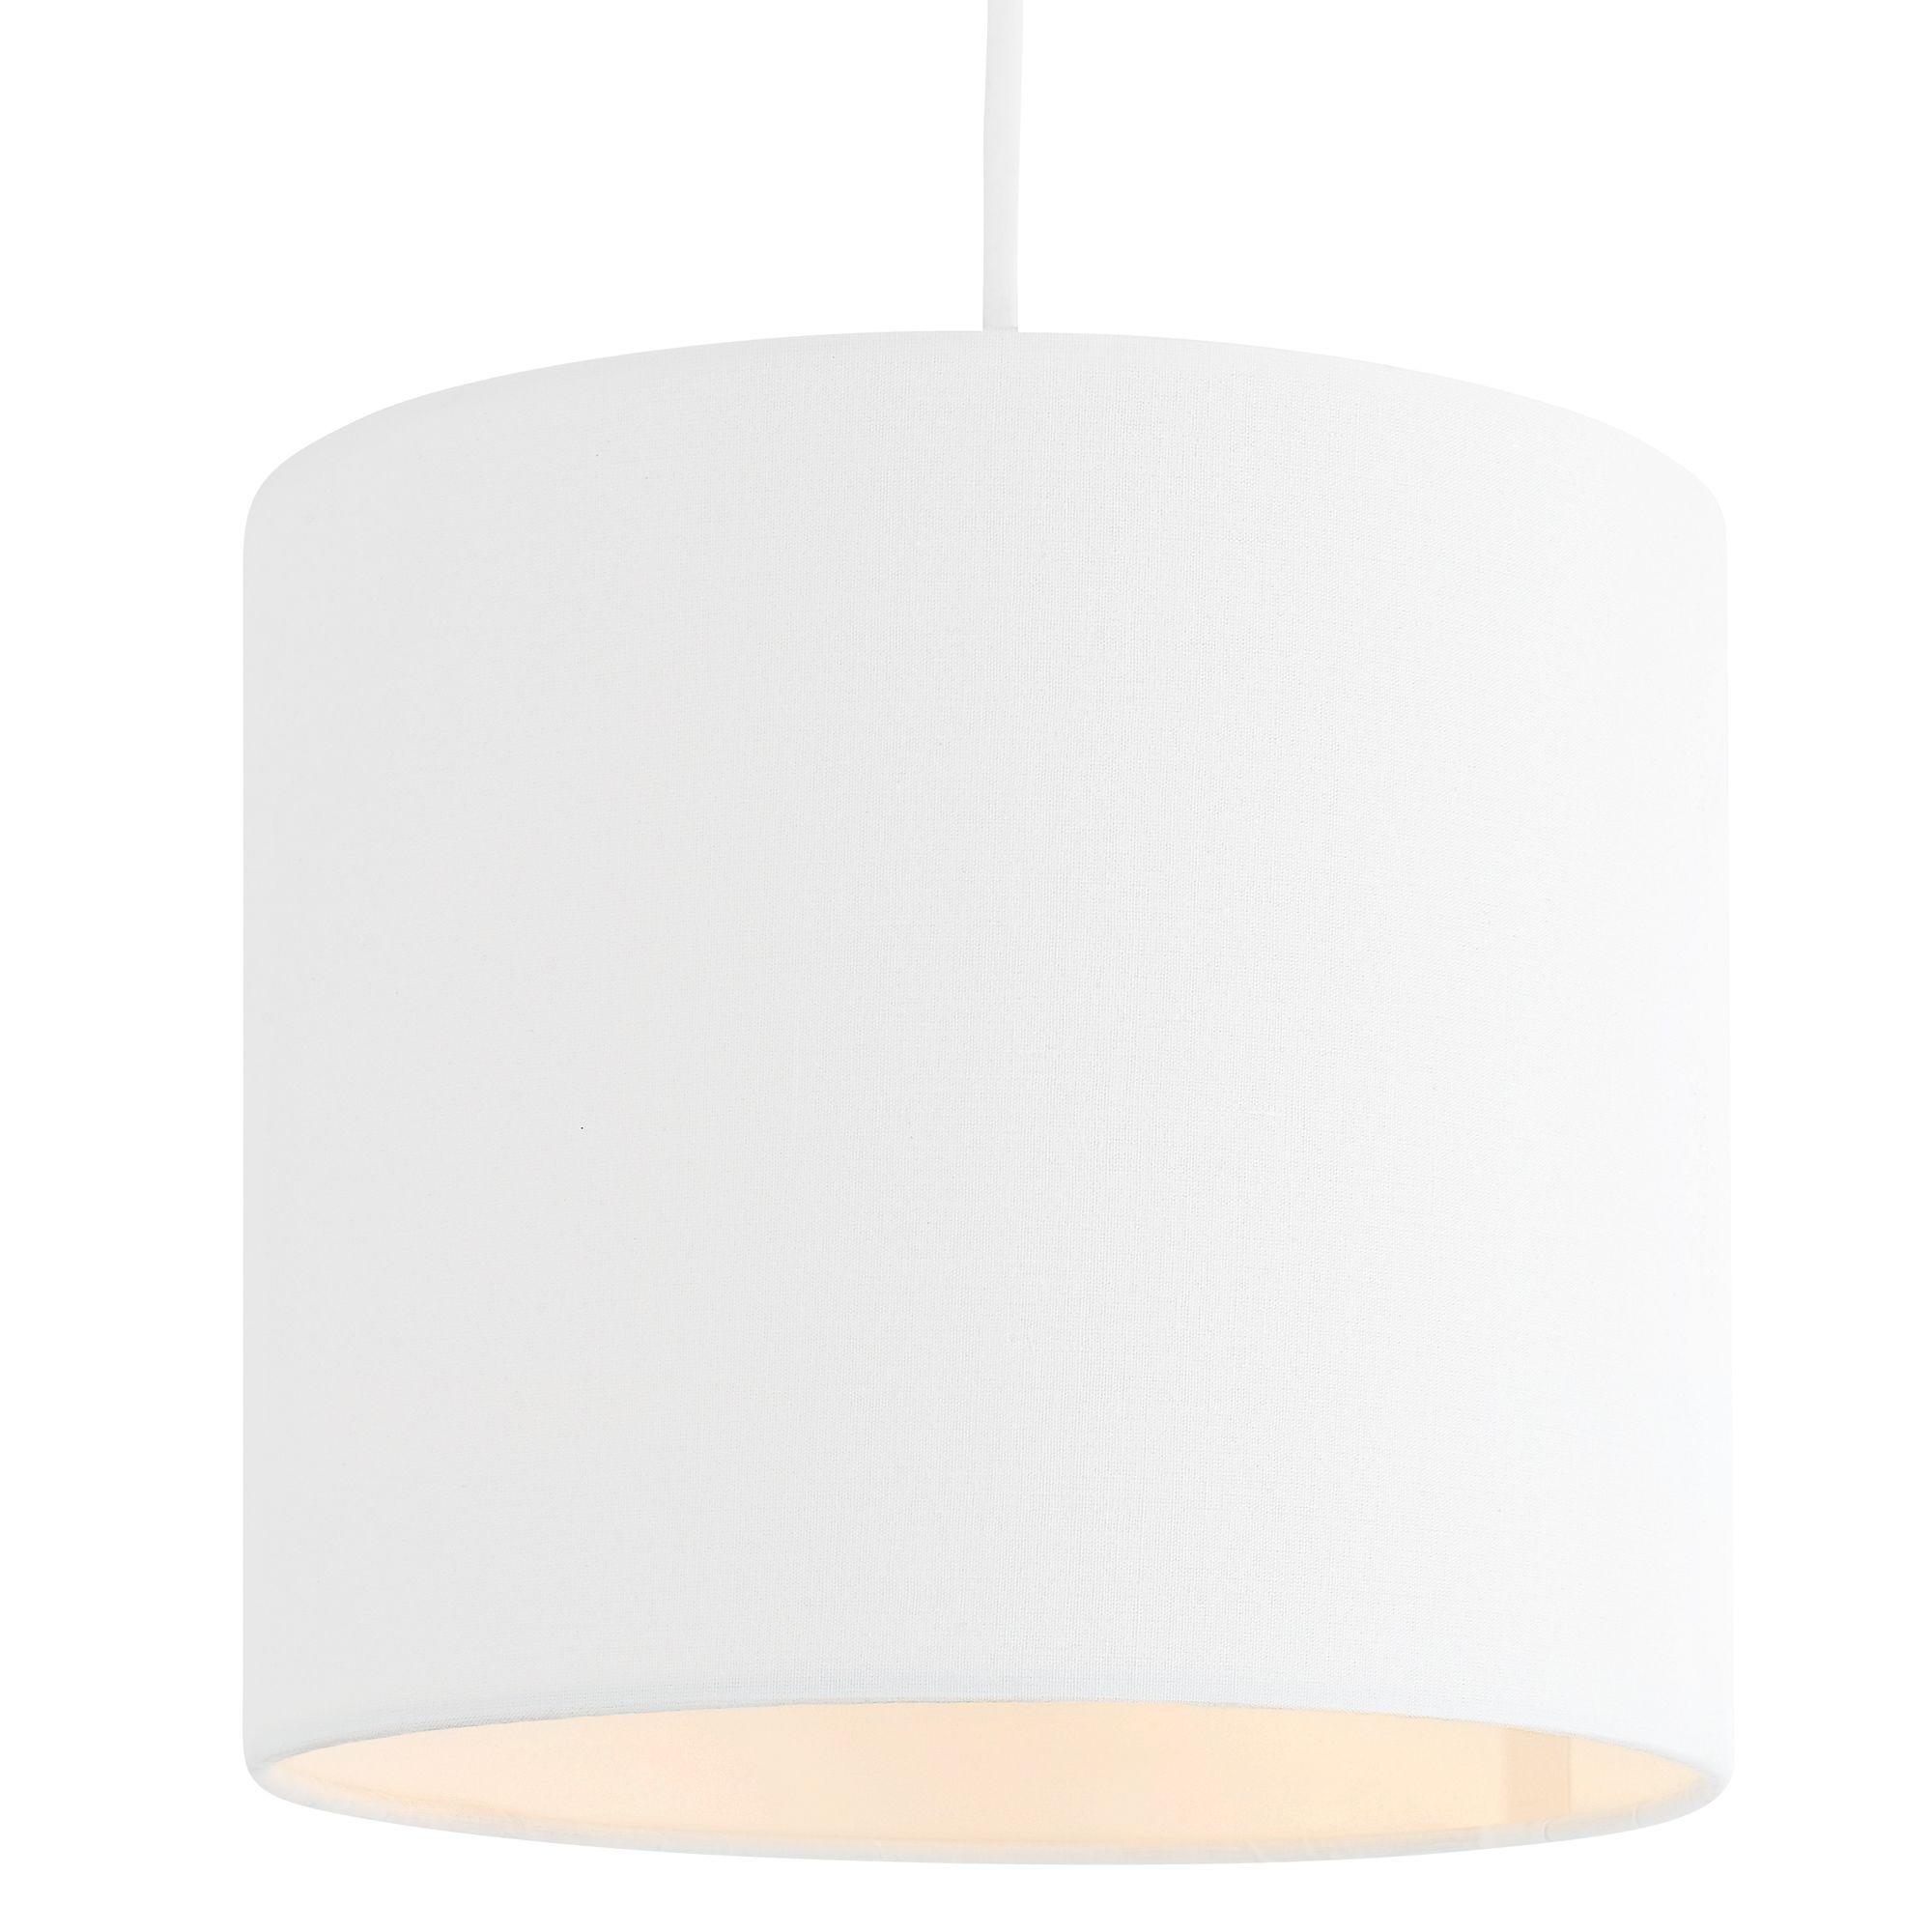 Diy at bq colours haymarket white light shade d200mm aloadofball Choice Image